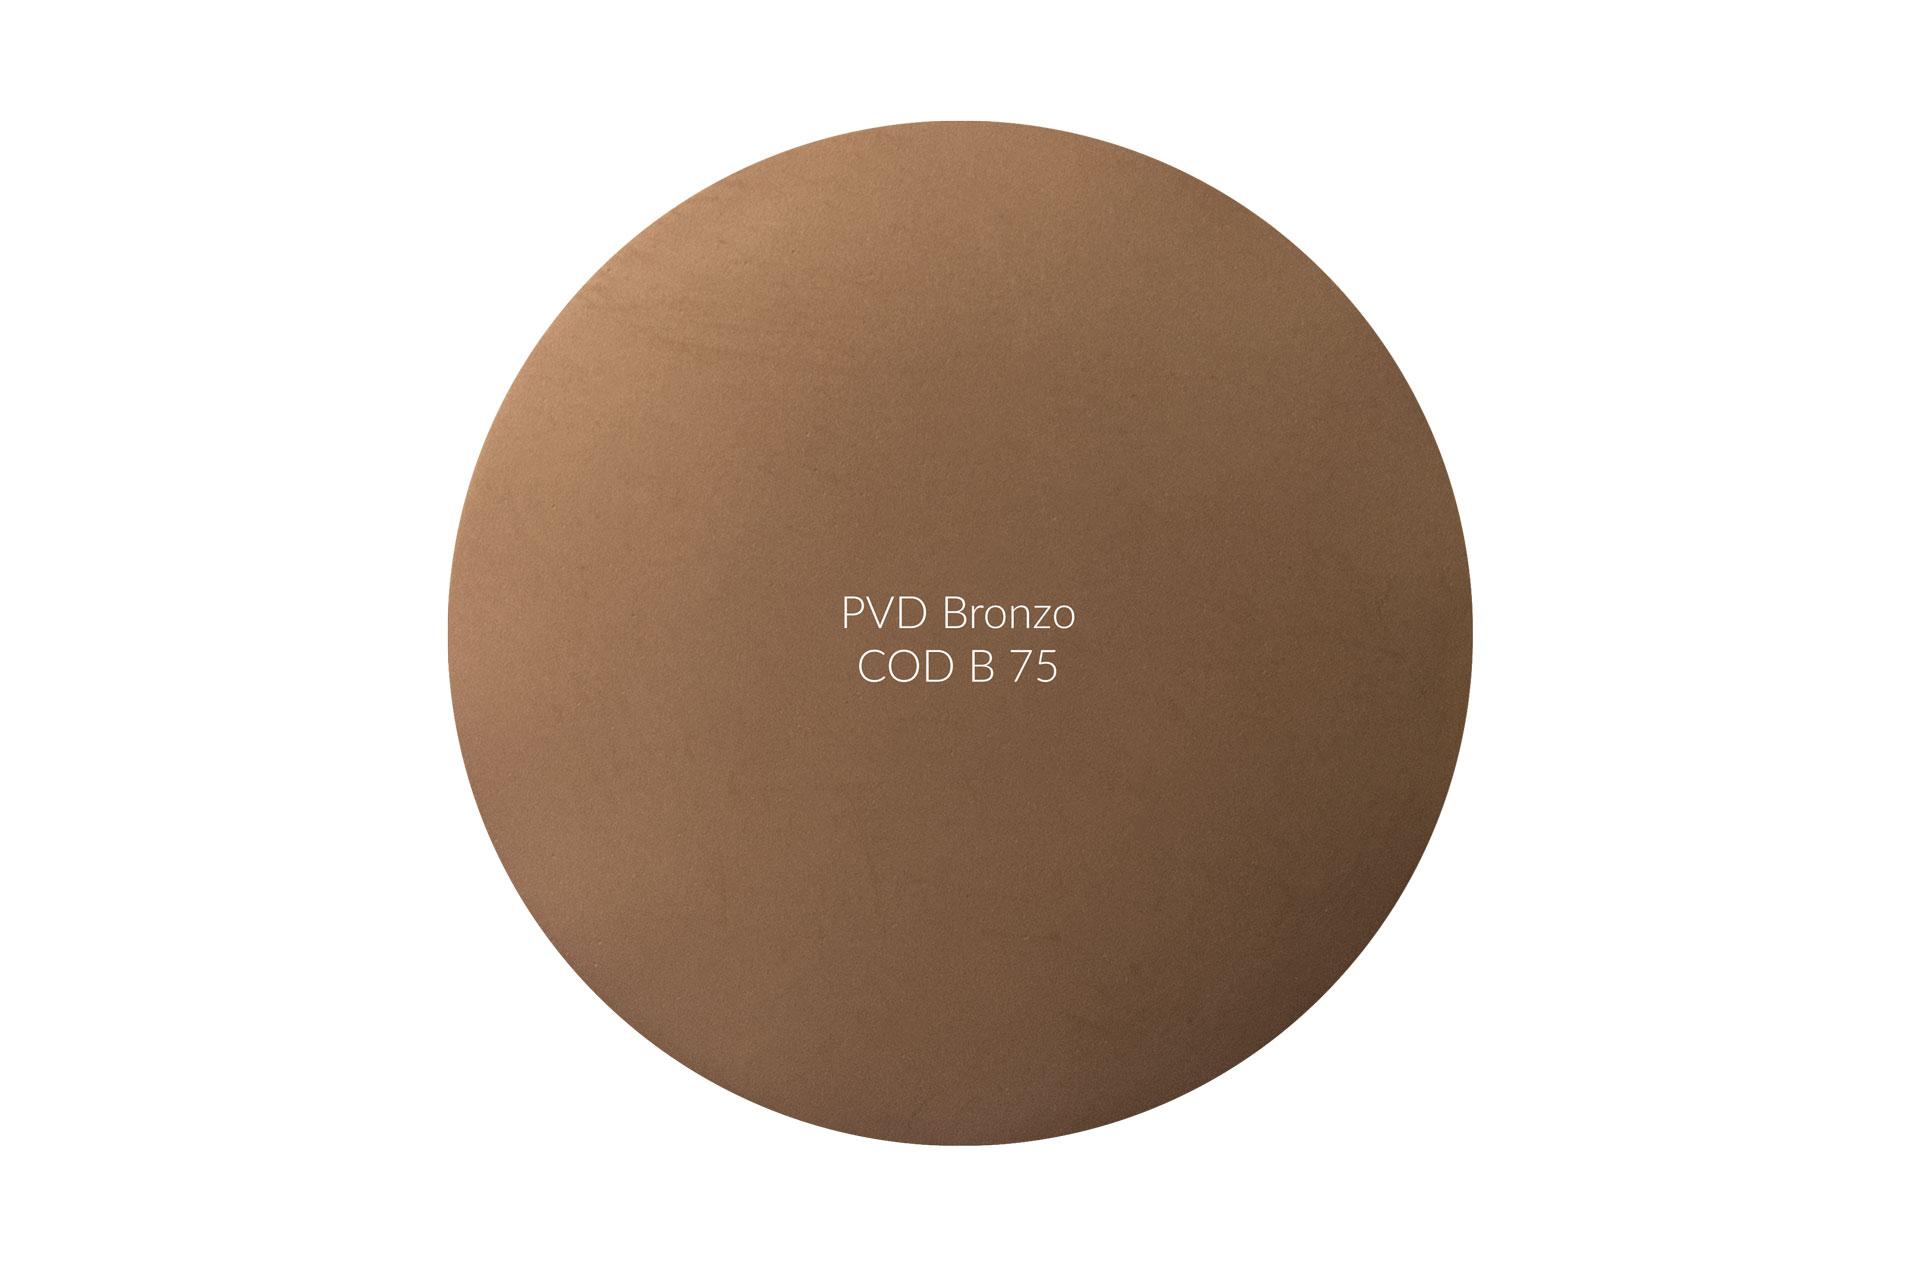 Dischetto PVD bronzo cod B 75 opaco